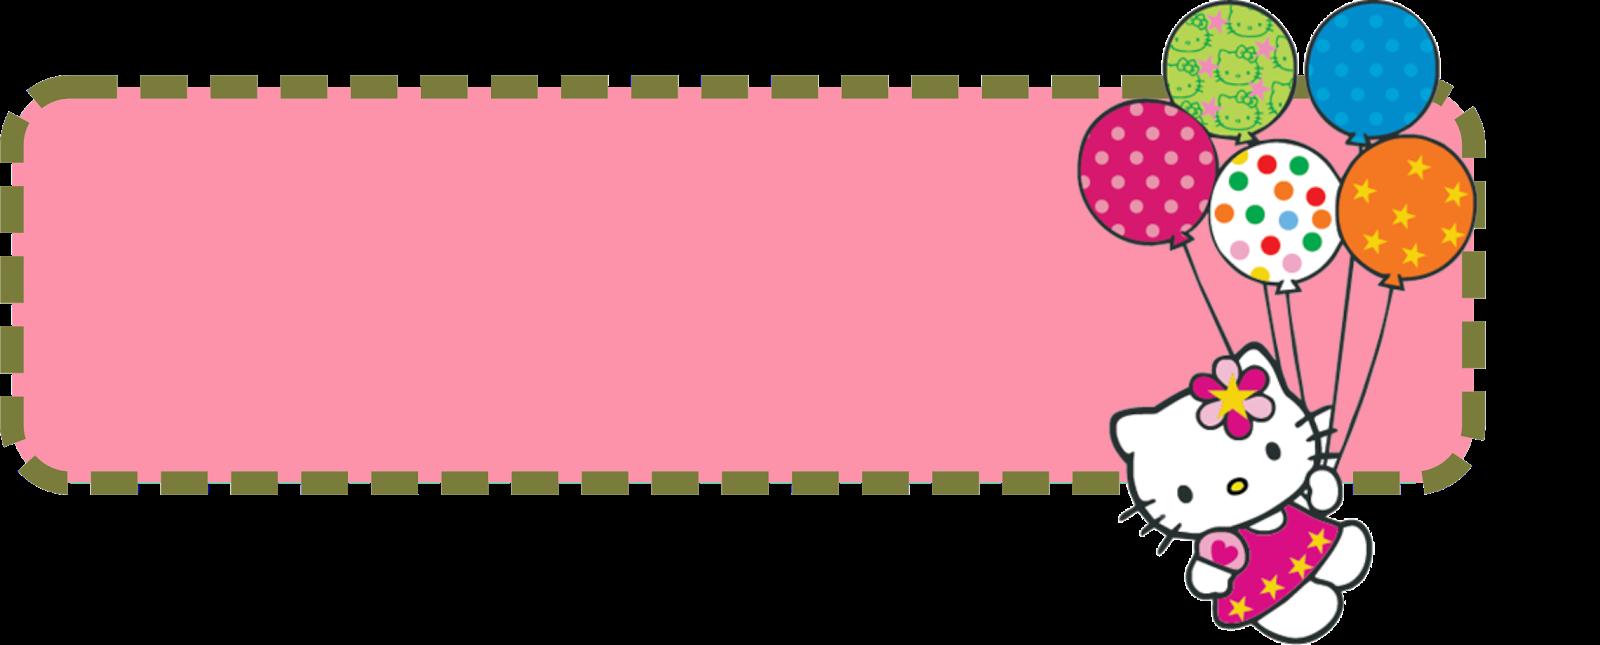 Hello Kitty Banner Template